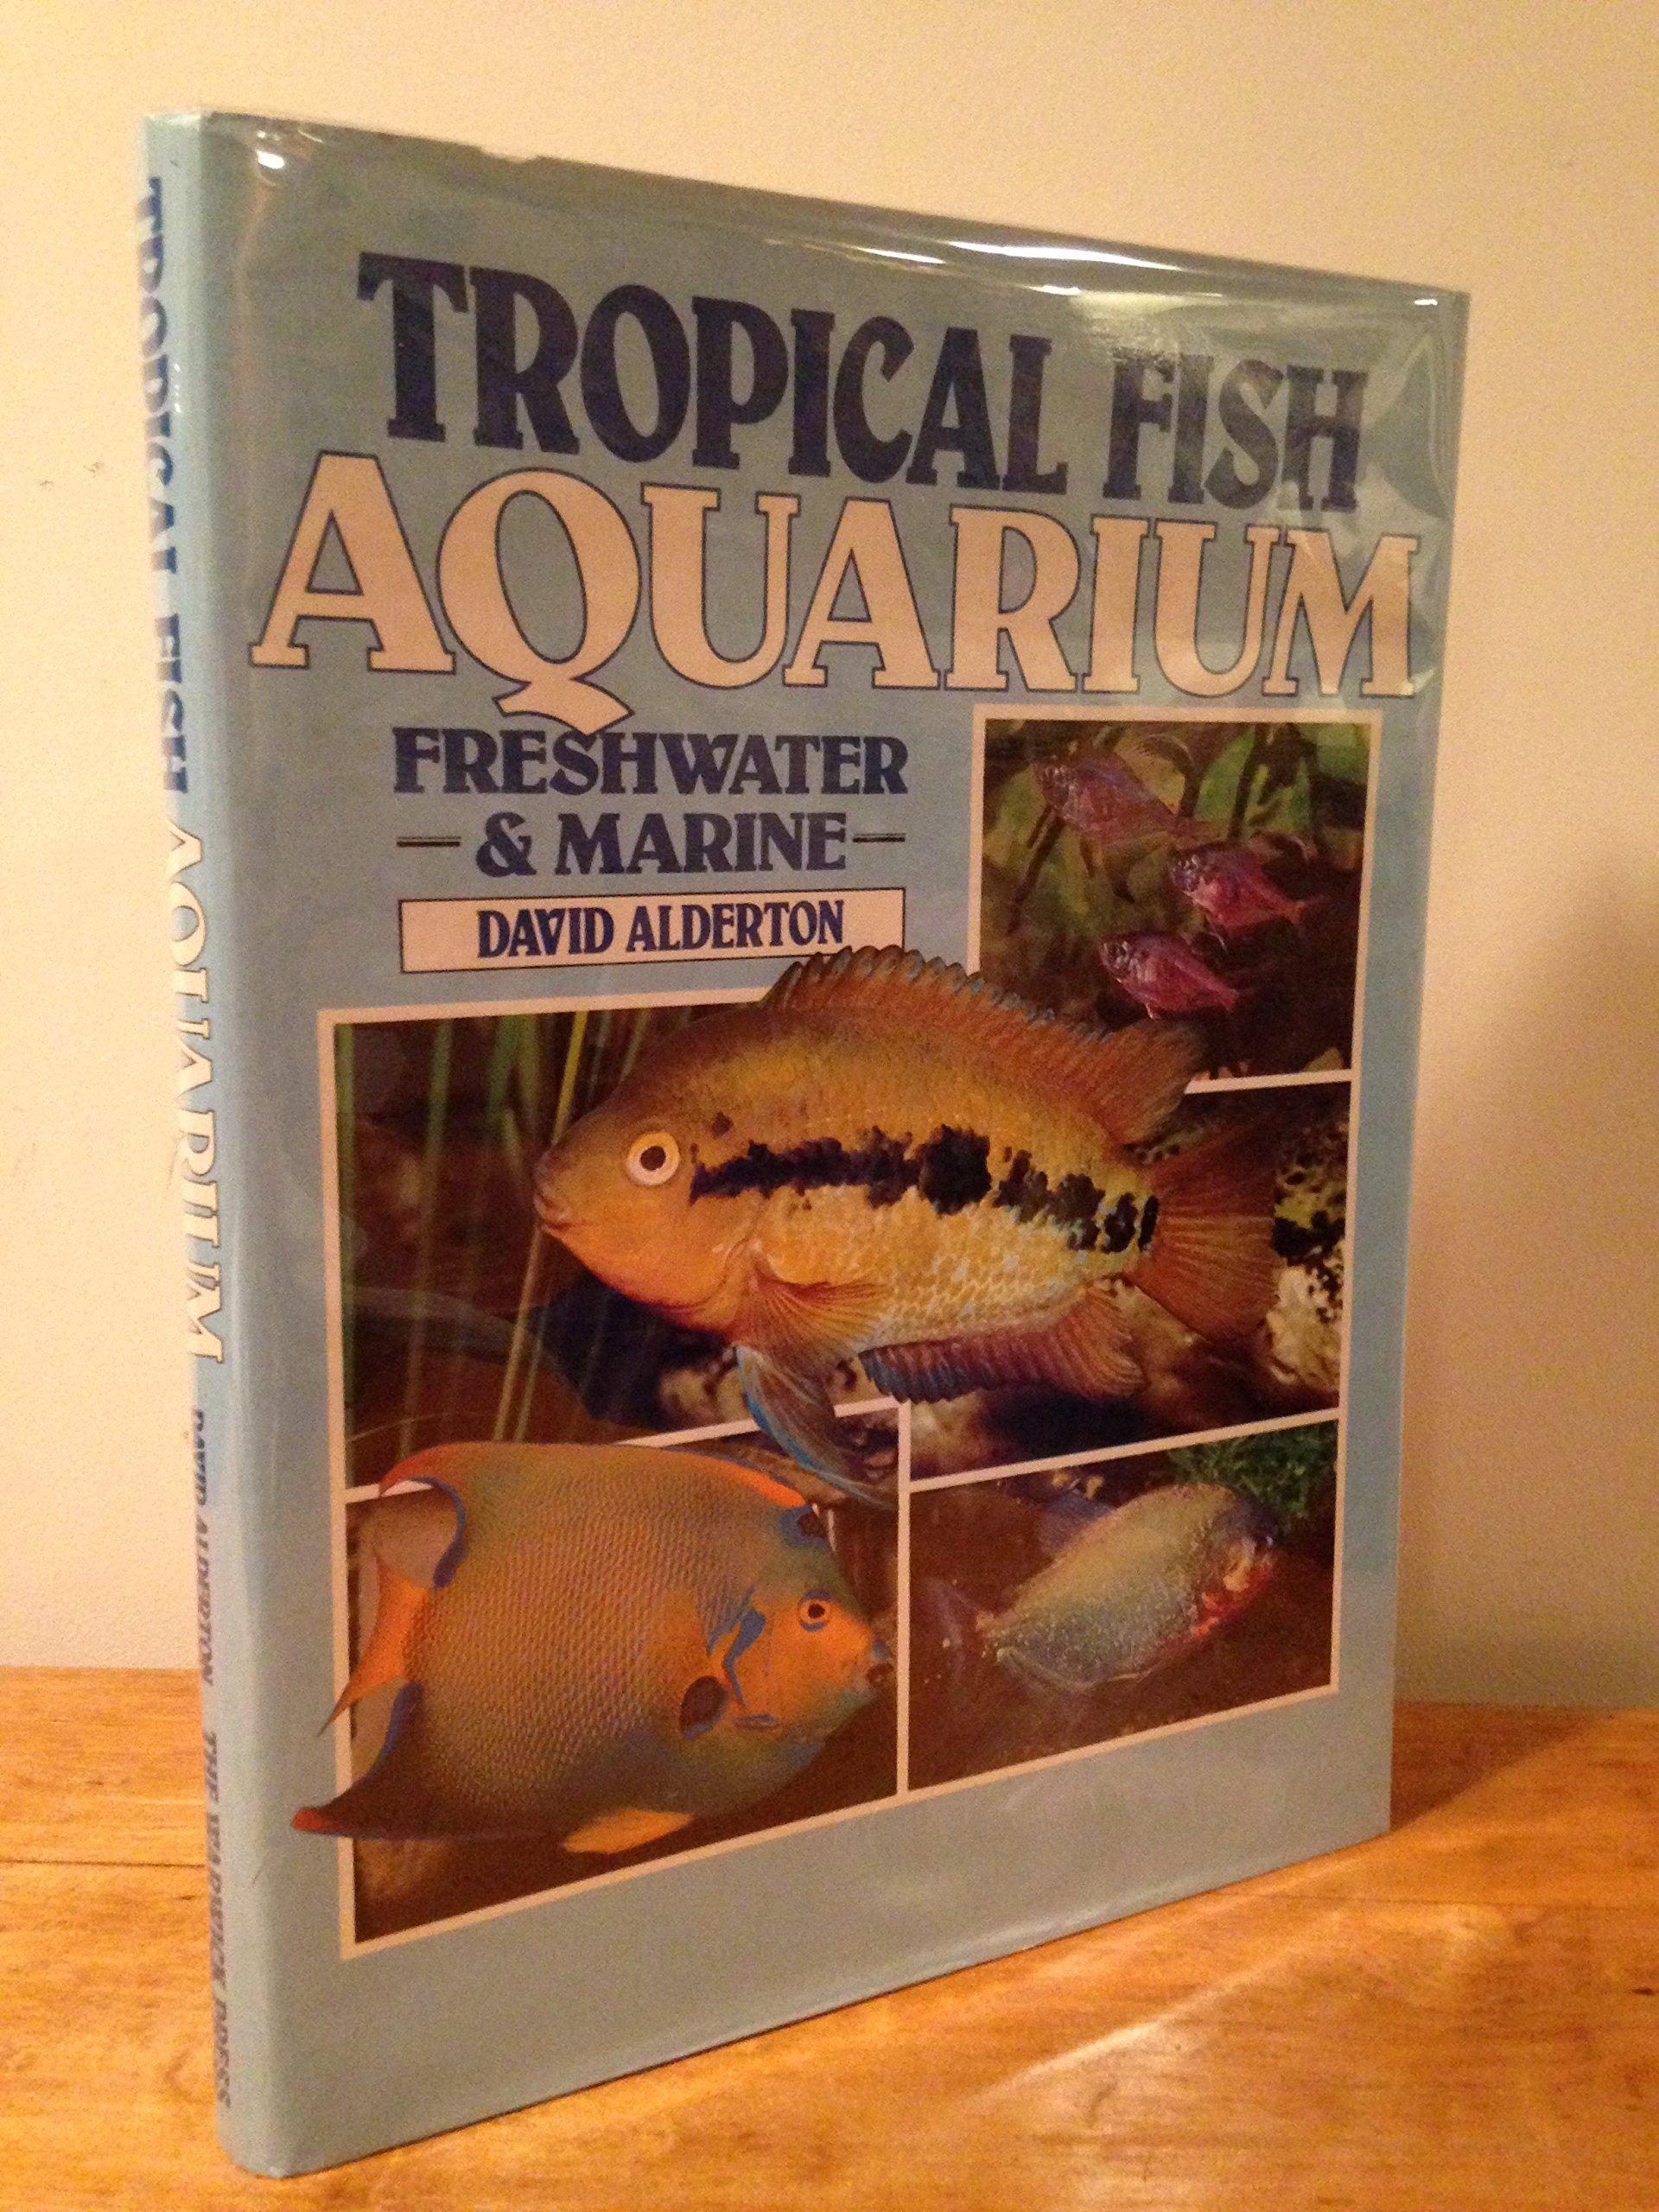 Tropical Fish - Aquarium, Freshwater and Marine